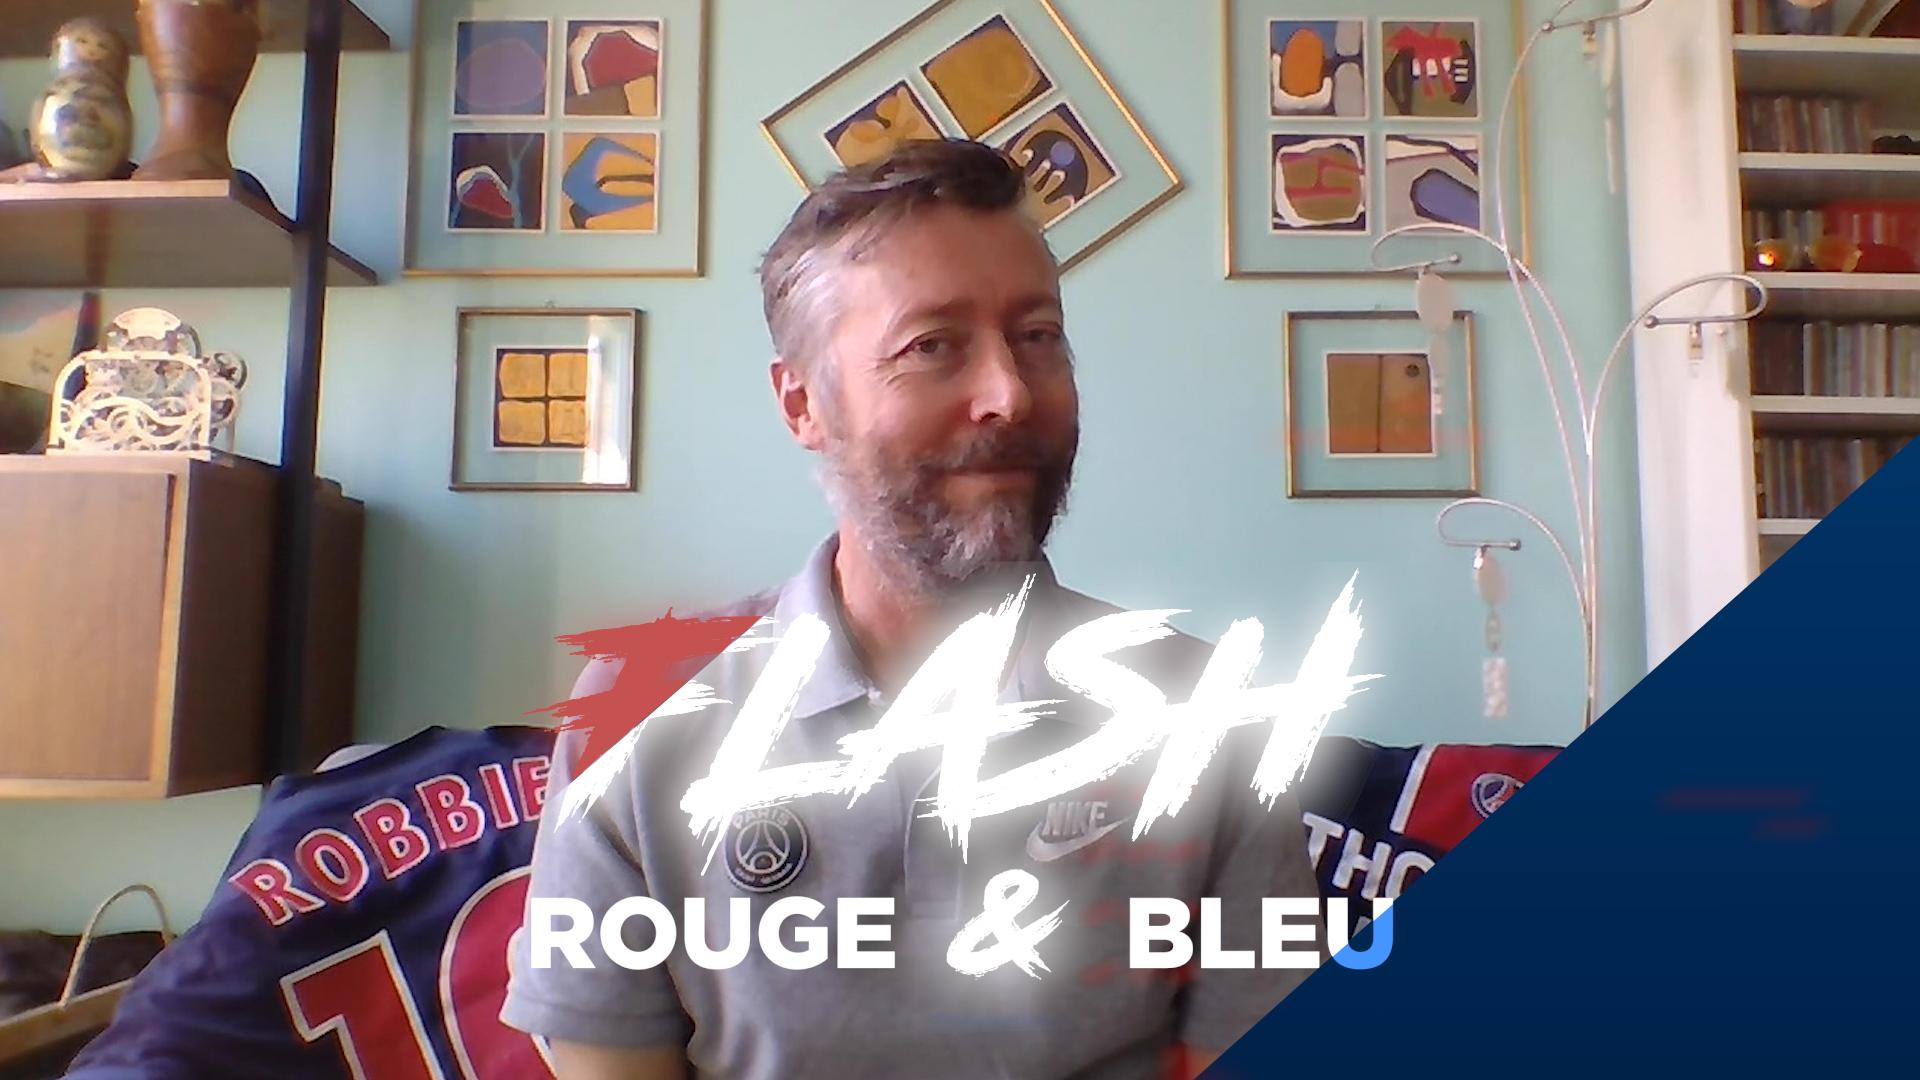 Rouge & Bleu News Flash – Fundraising, coaching and European memories